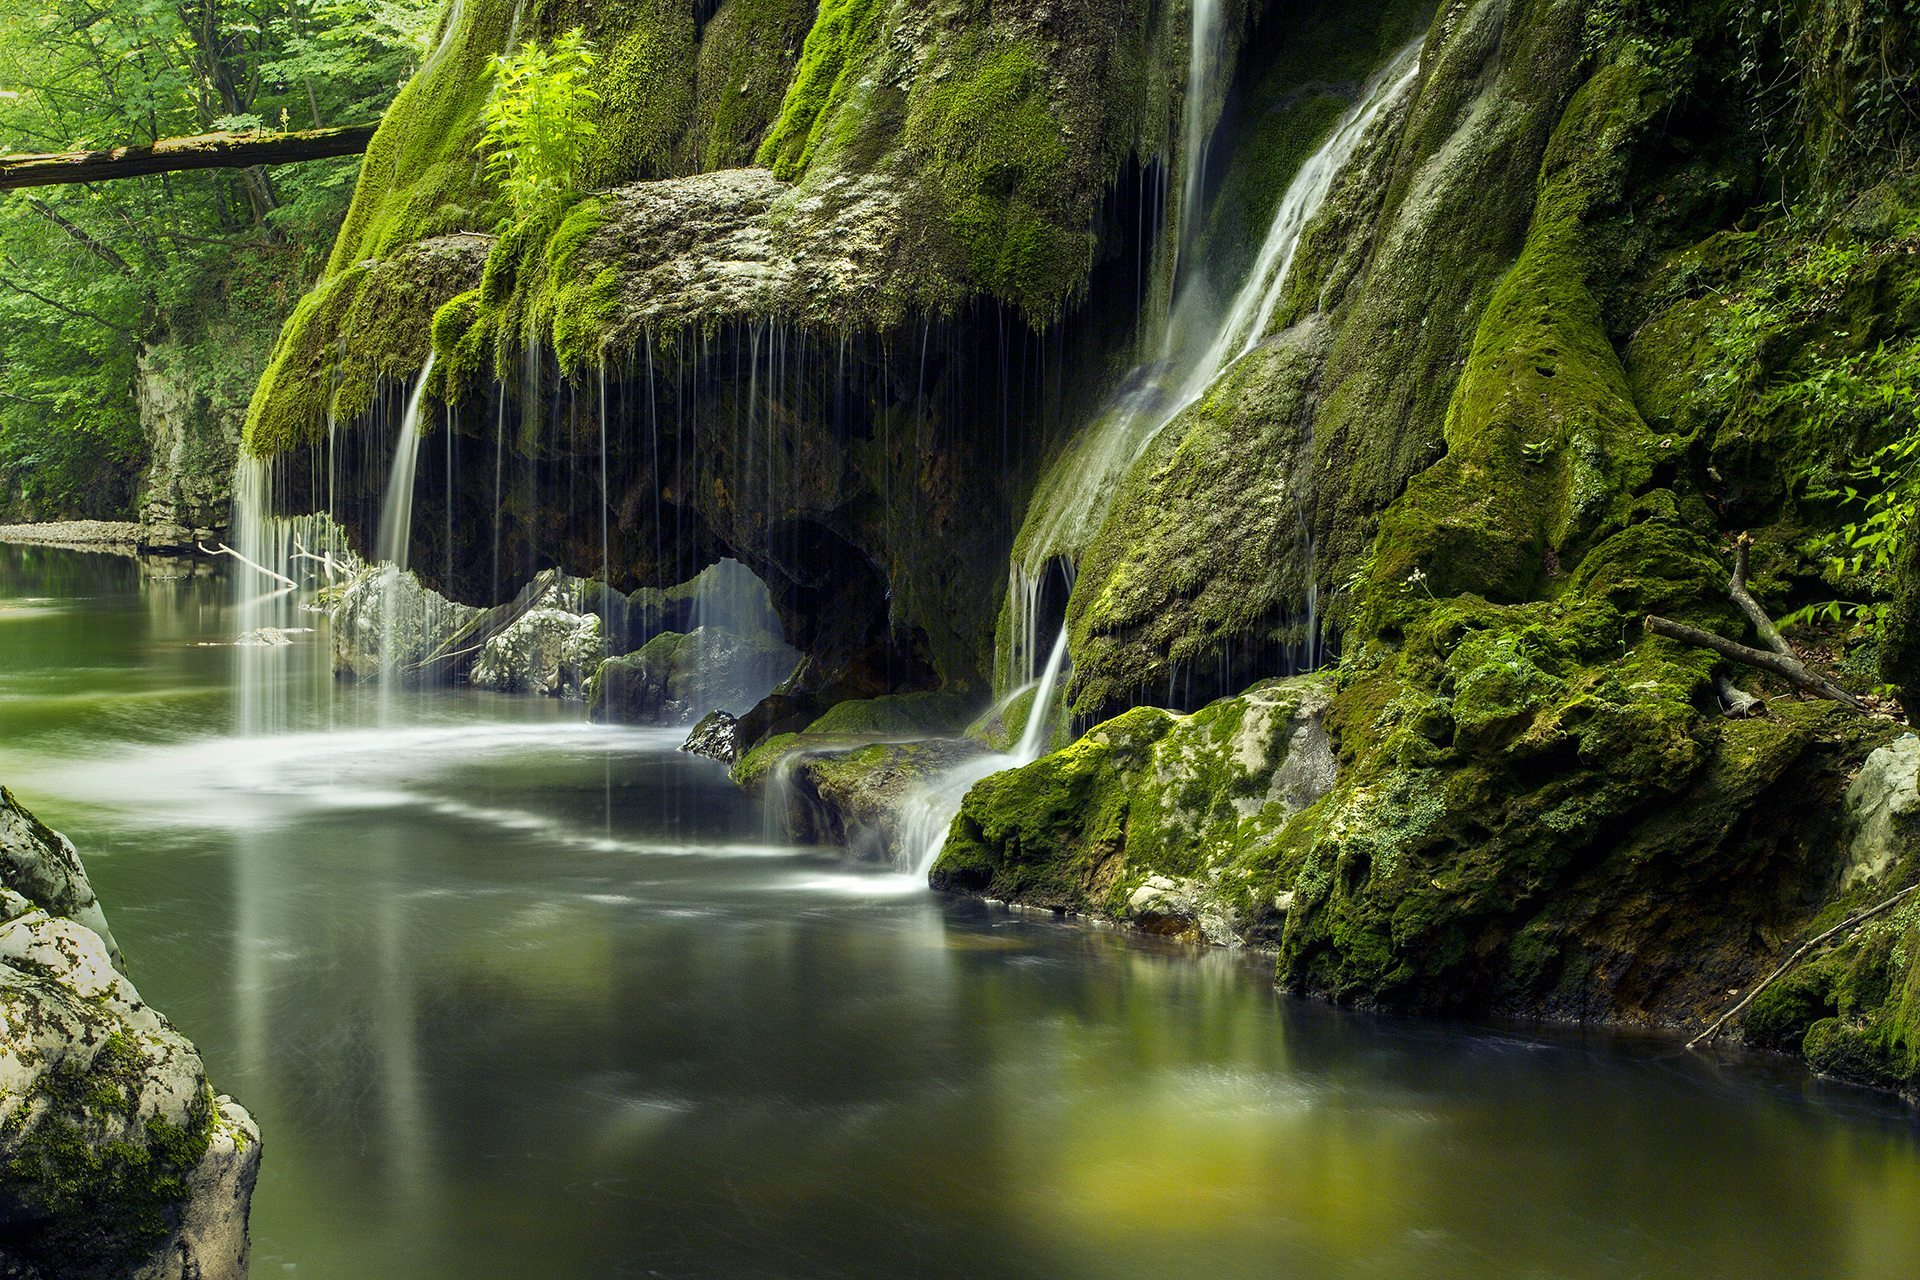 Air Terjun Paling Indah Di Dunia Bigar Waterfall   Azhan.co